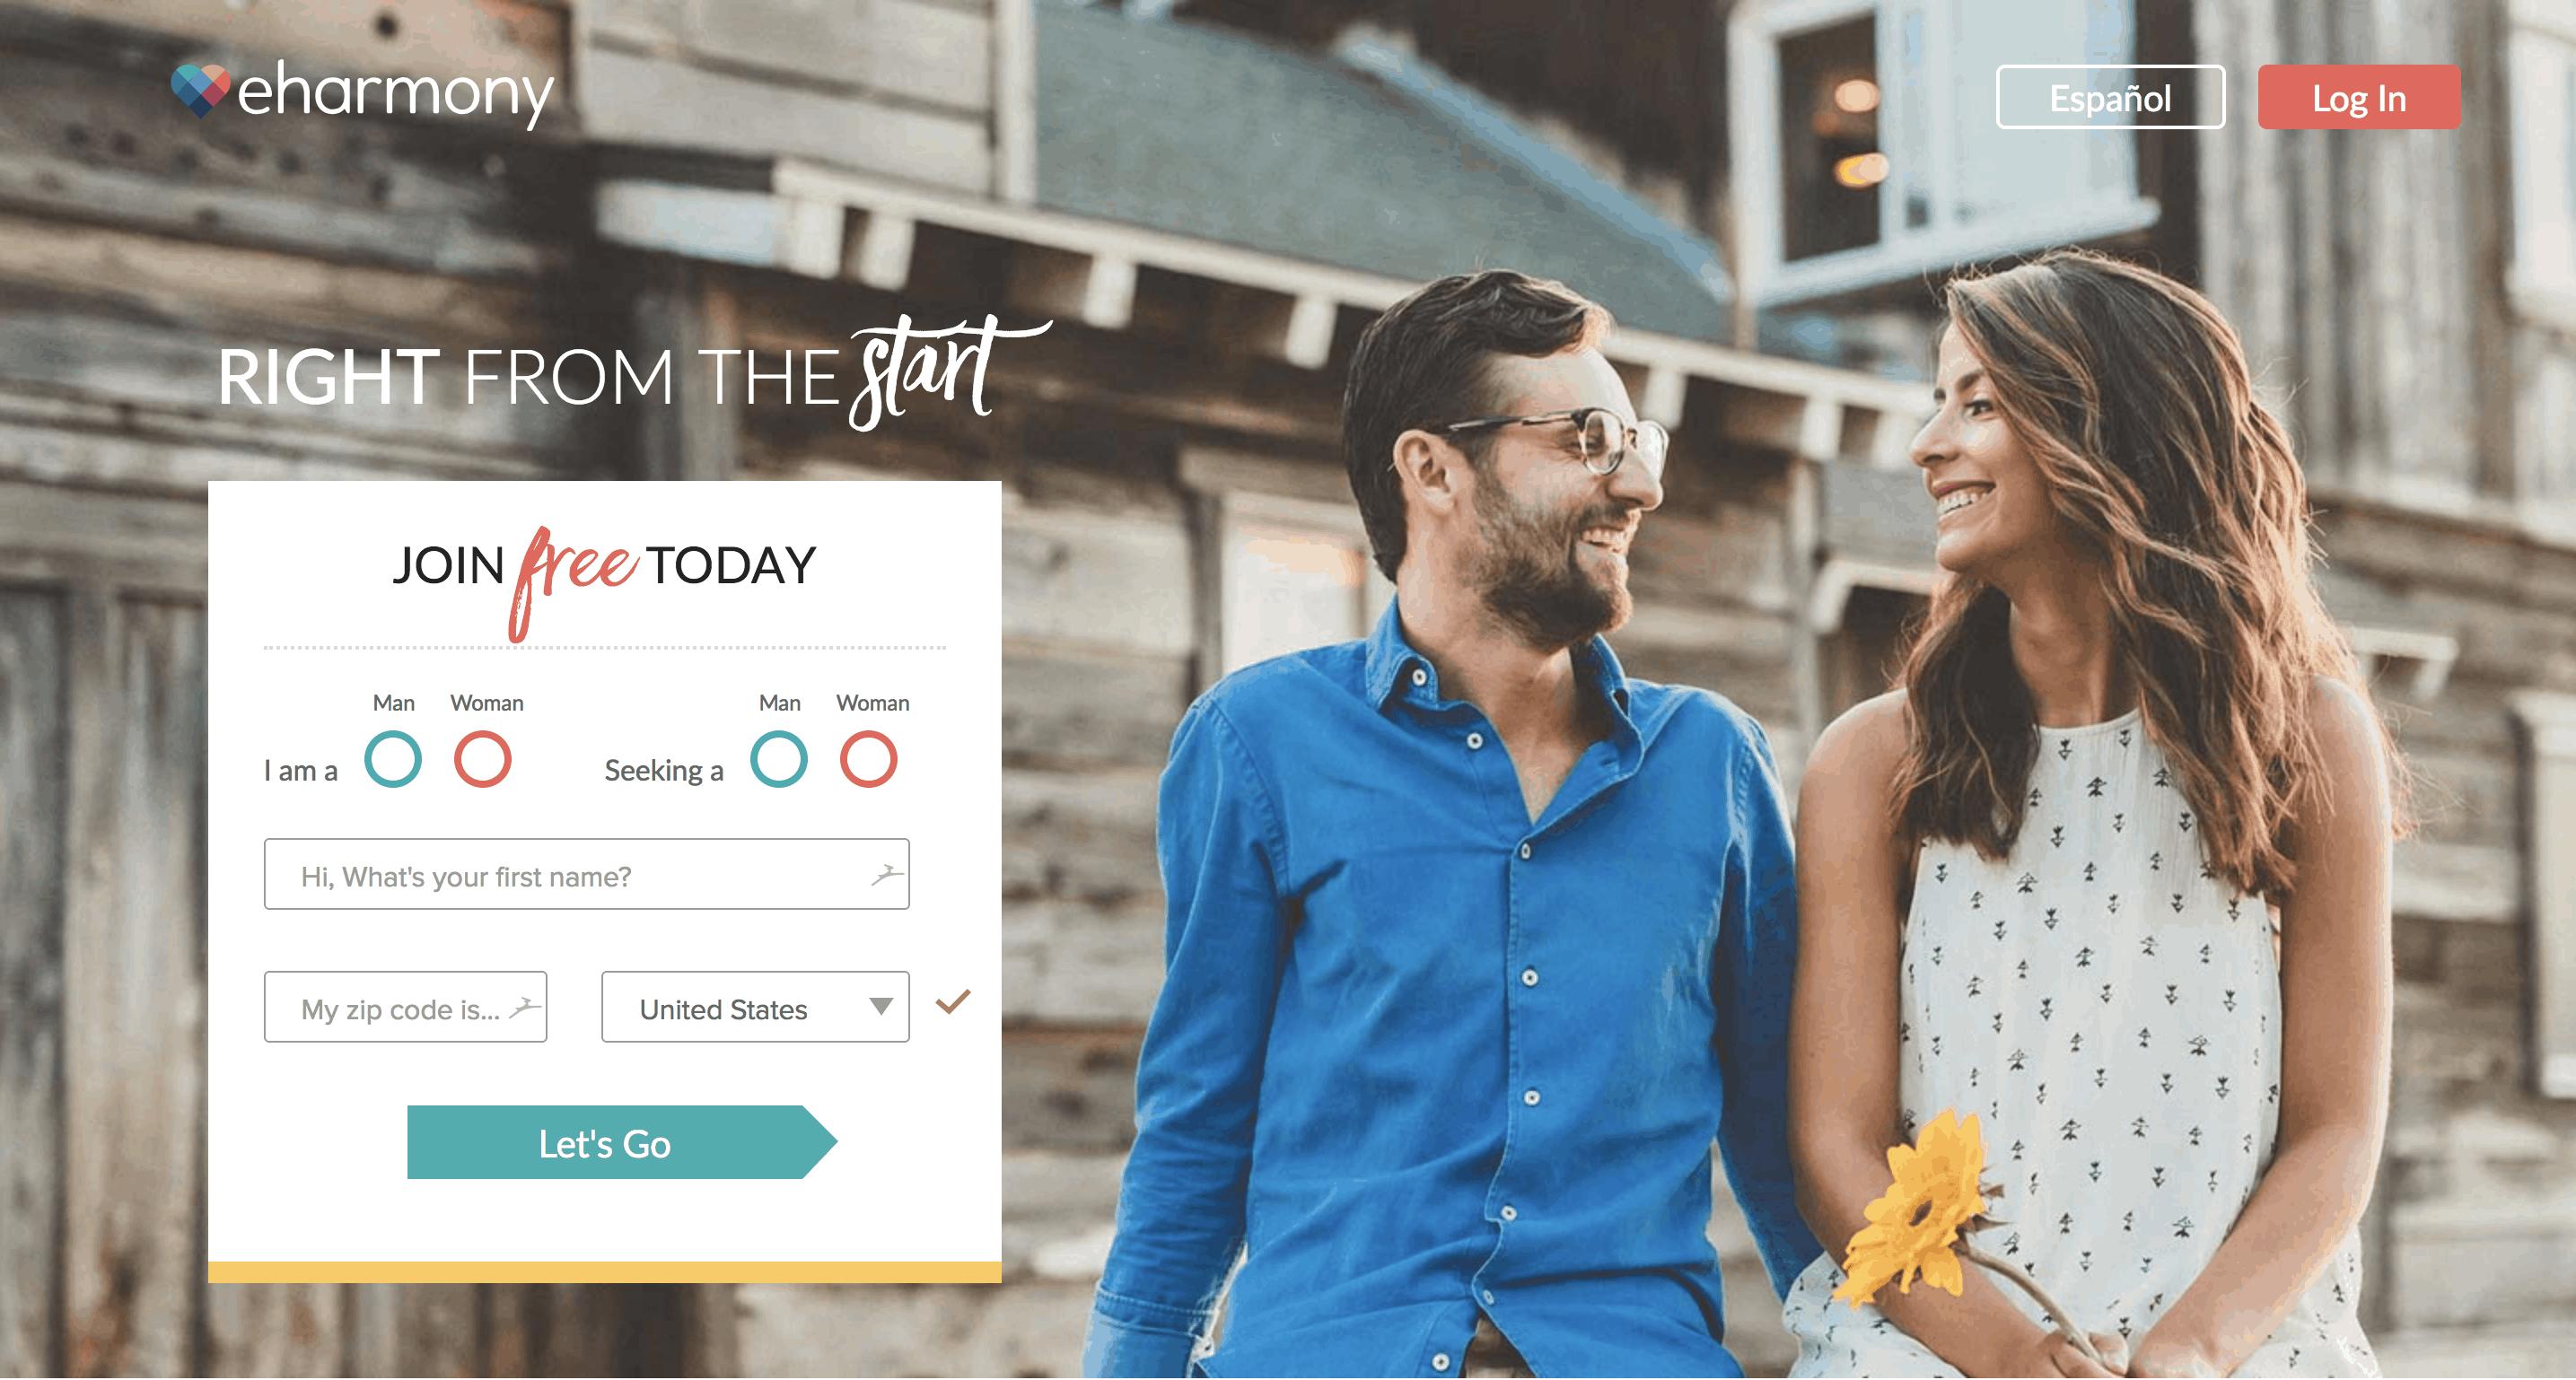 Pknm tinder dating site